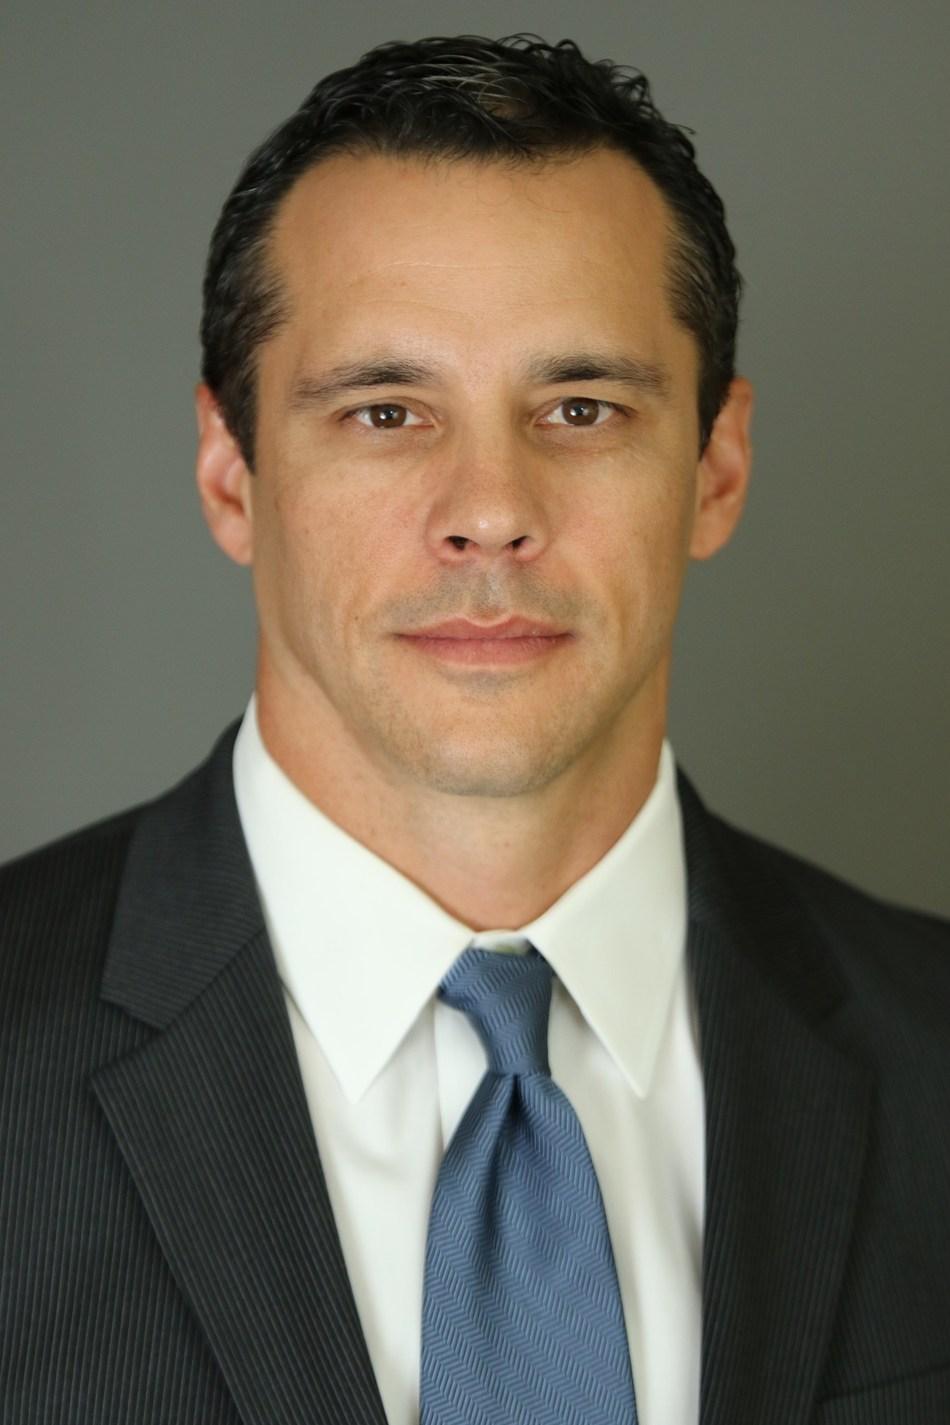 Michael Roub joins Western Dental & Orthodontics as Vice President of Business Development.